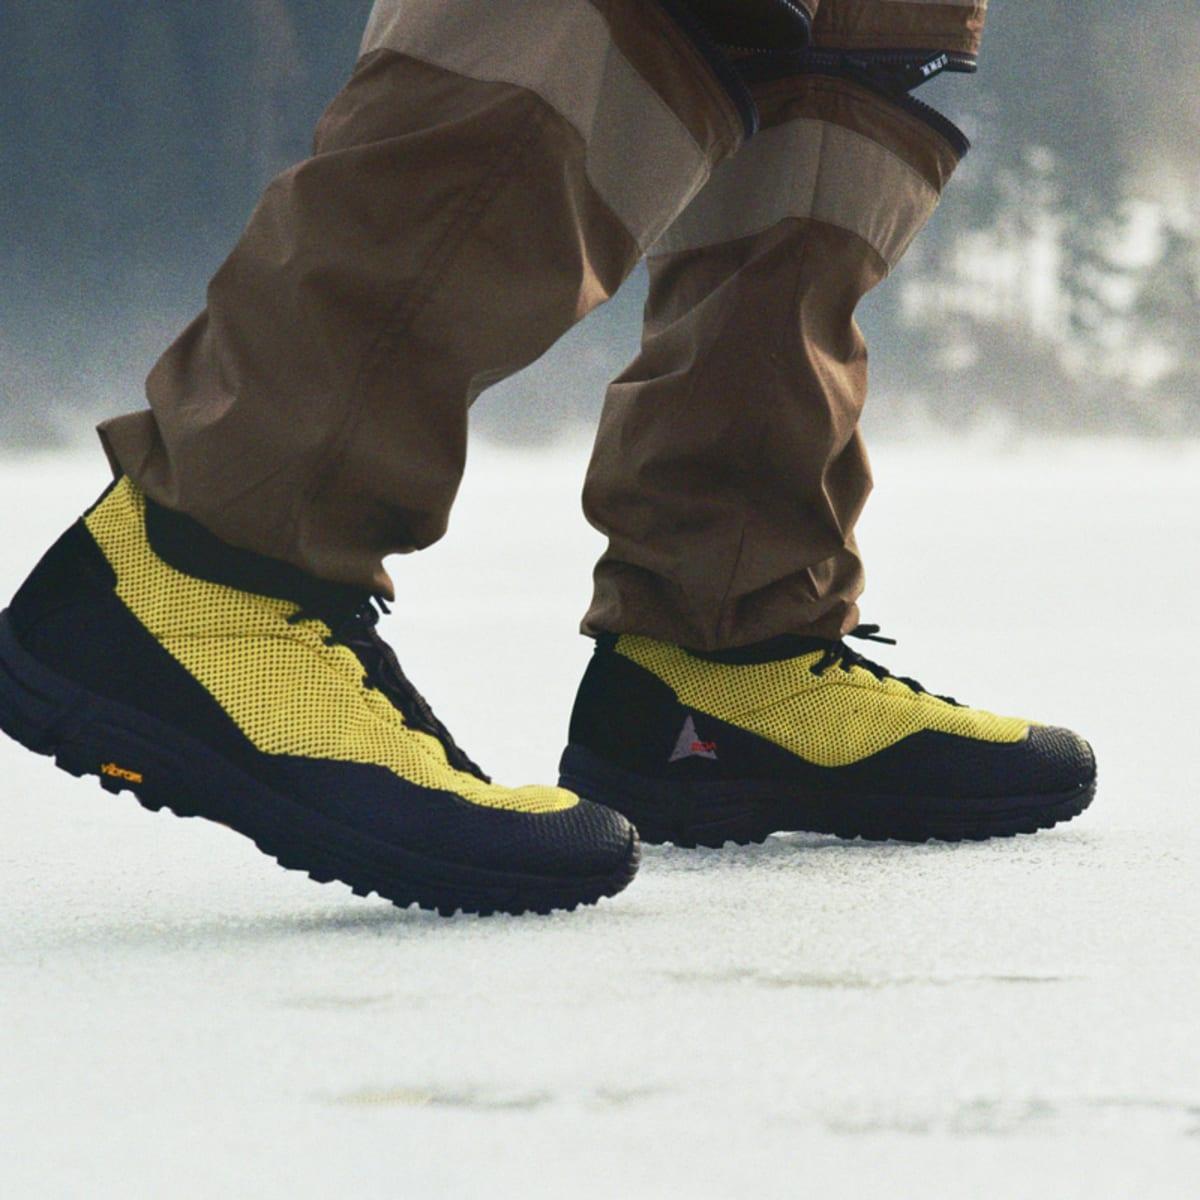 Roa debuts their F/W '18 hiking shoe